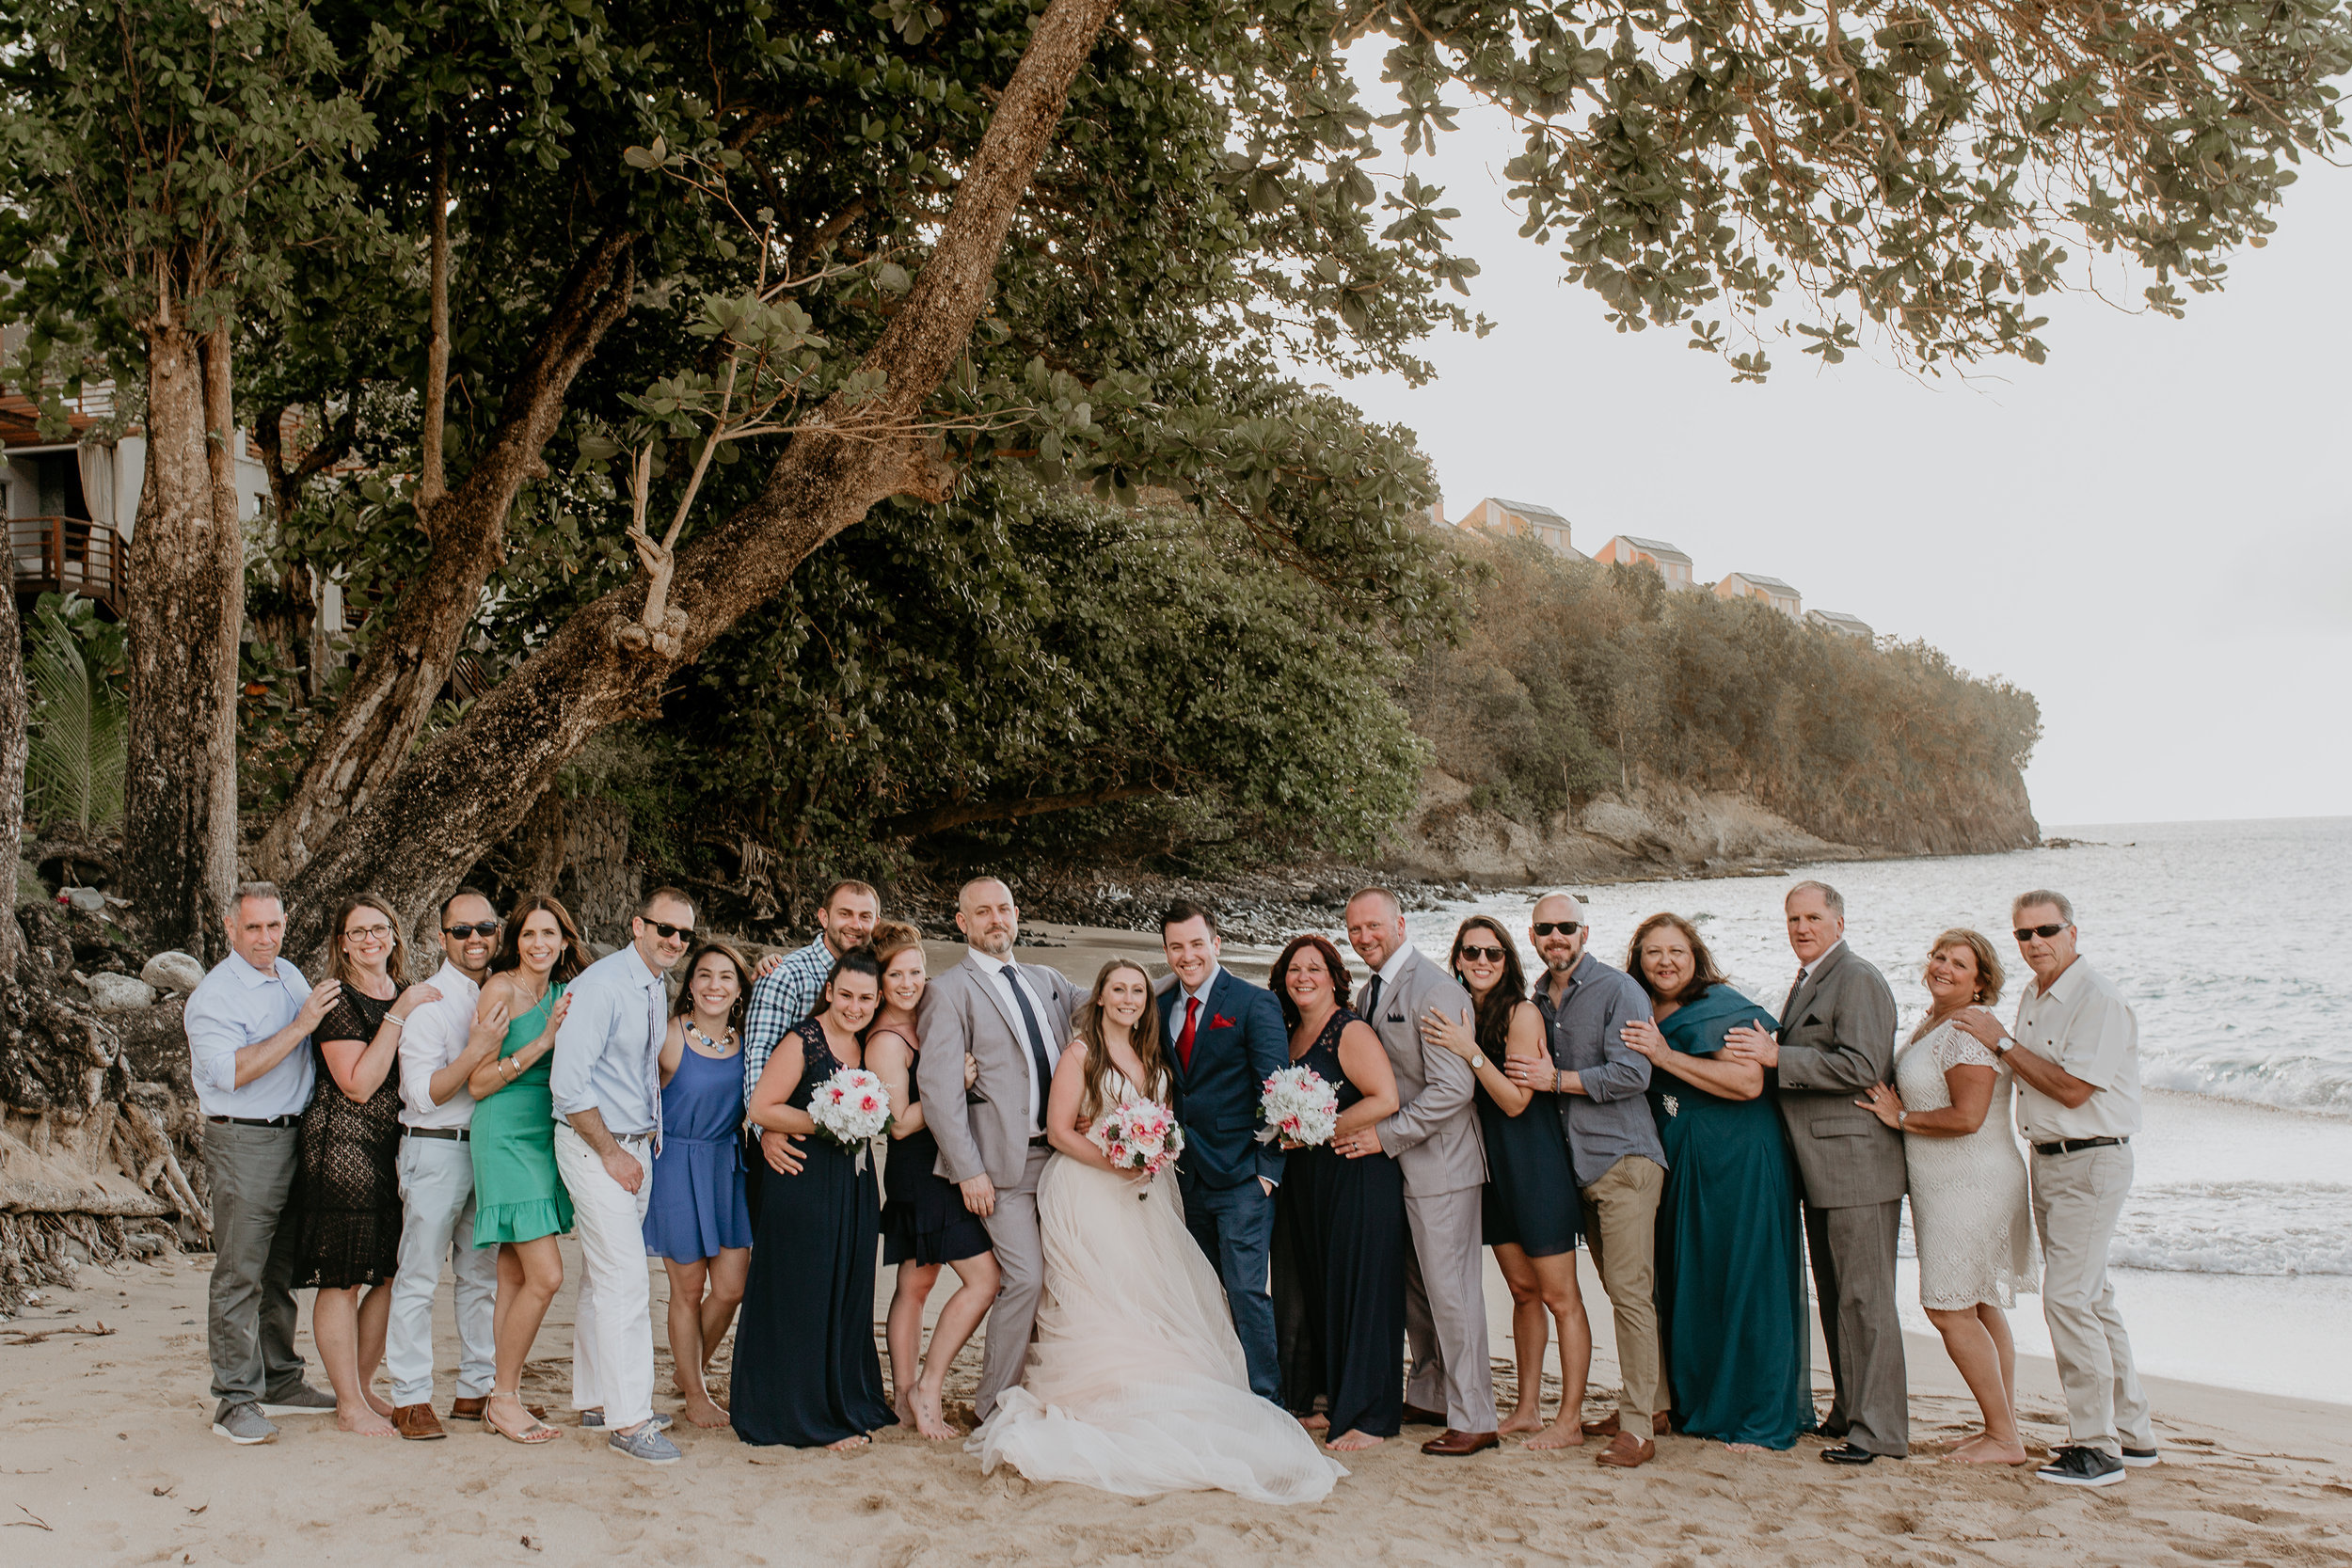 nicole-daacke-photography-destination-wedding-in-st-lucia-sandals-la-toc-intimate-island-wedding-carribean-elopement-photographer-chill-island-wedding-76.jpg